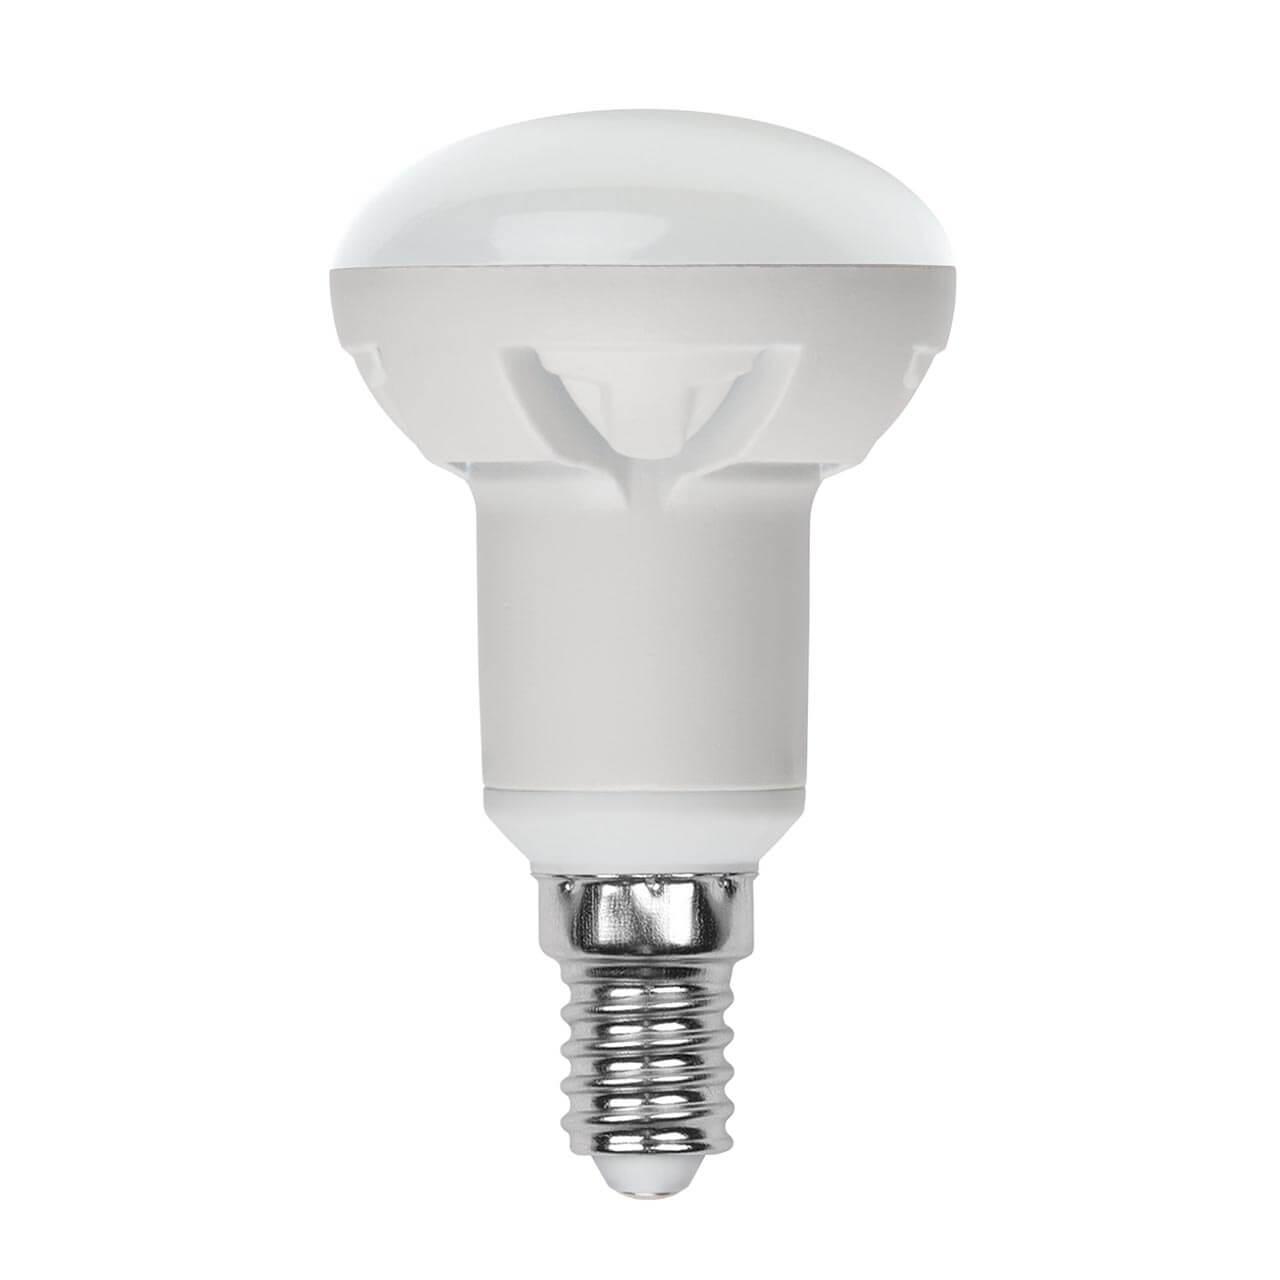 Лампа светодиодная диммируемая (UL-00004710) Uniel E14 7W 3000K матовая LED-R50 7W/3000K/E14/FR/DIM PLP01WH цена и фото